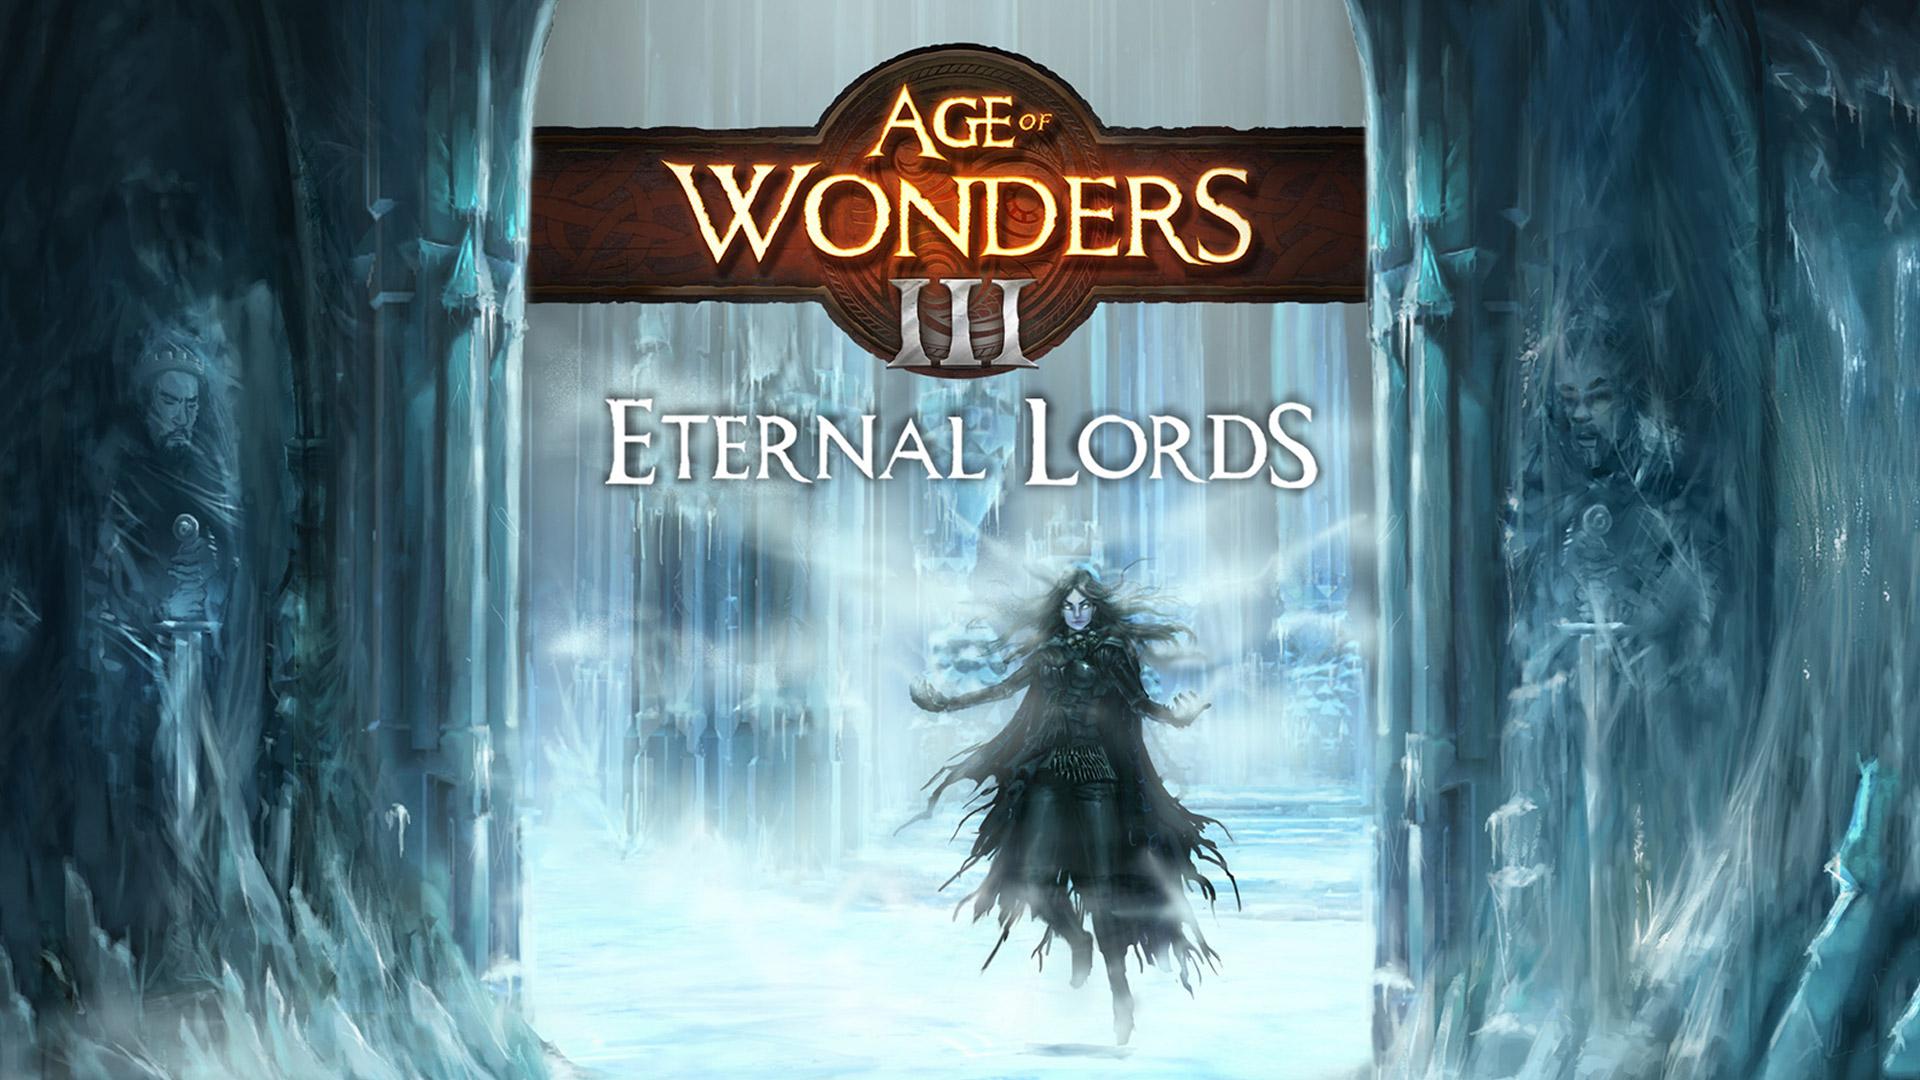 Free Age of Wonders III Wallpaper in 1920x1080